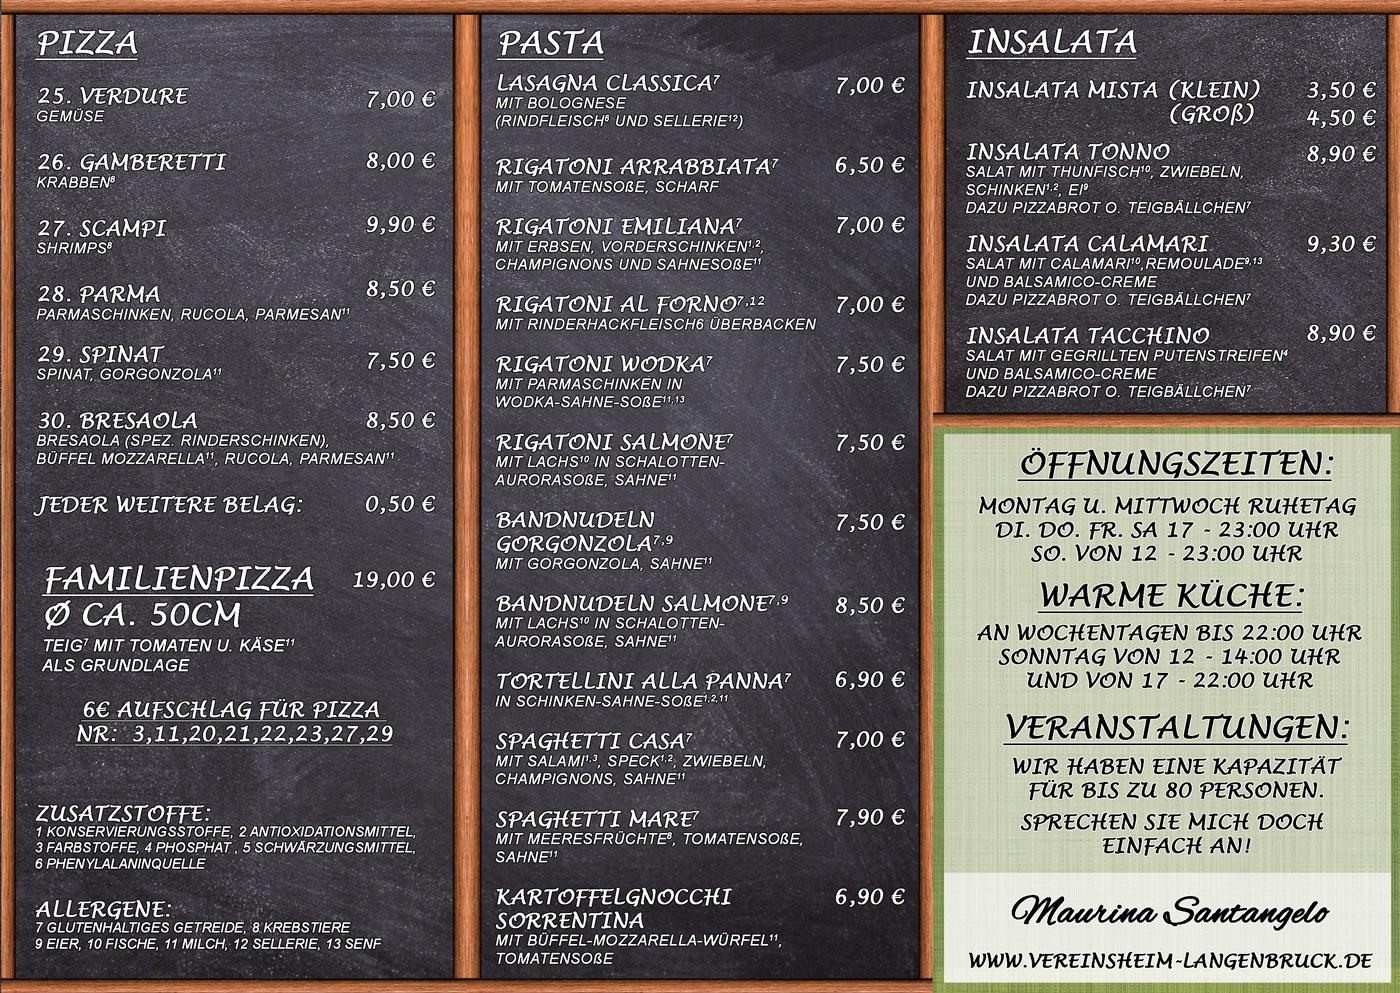 Speisekarte Pizzeria Lo Stadio